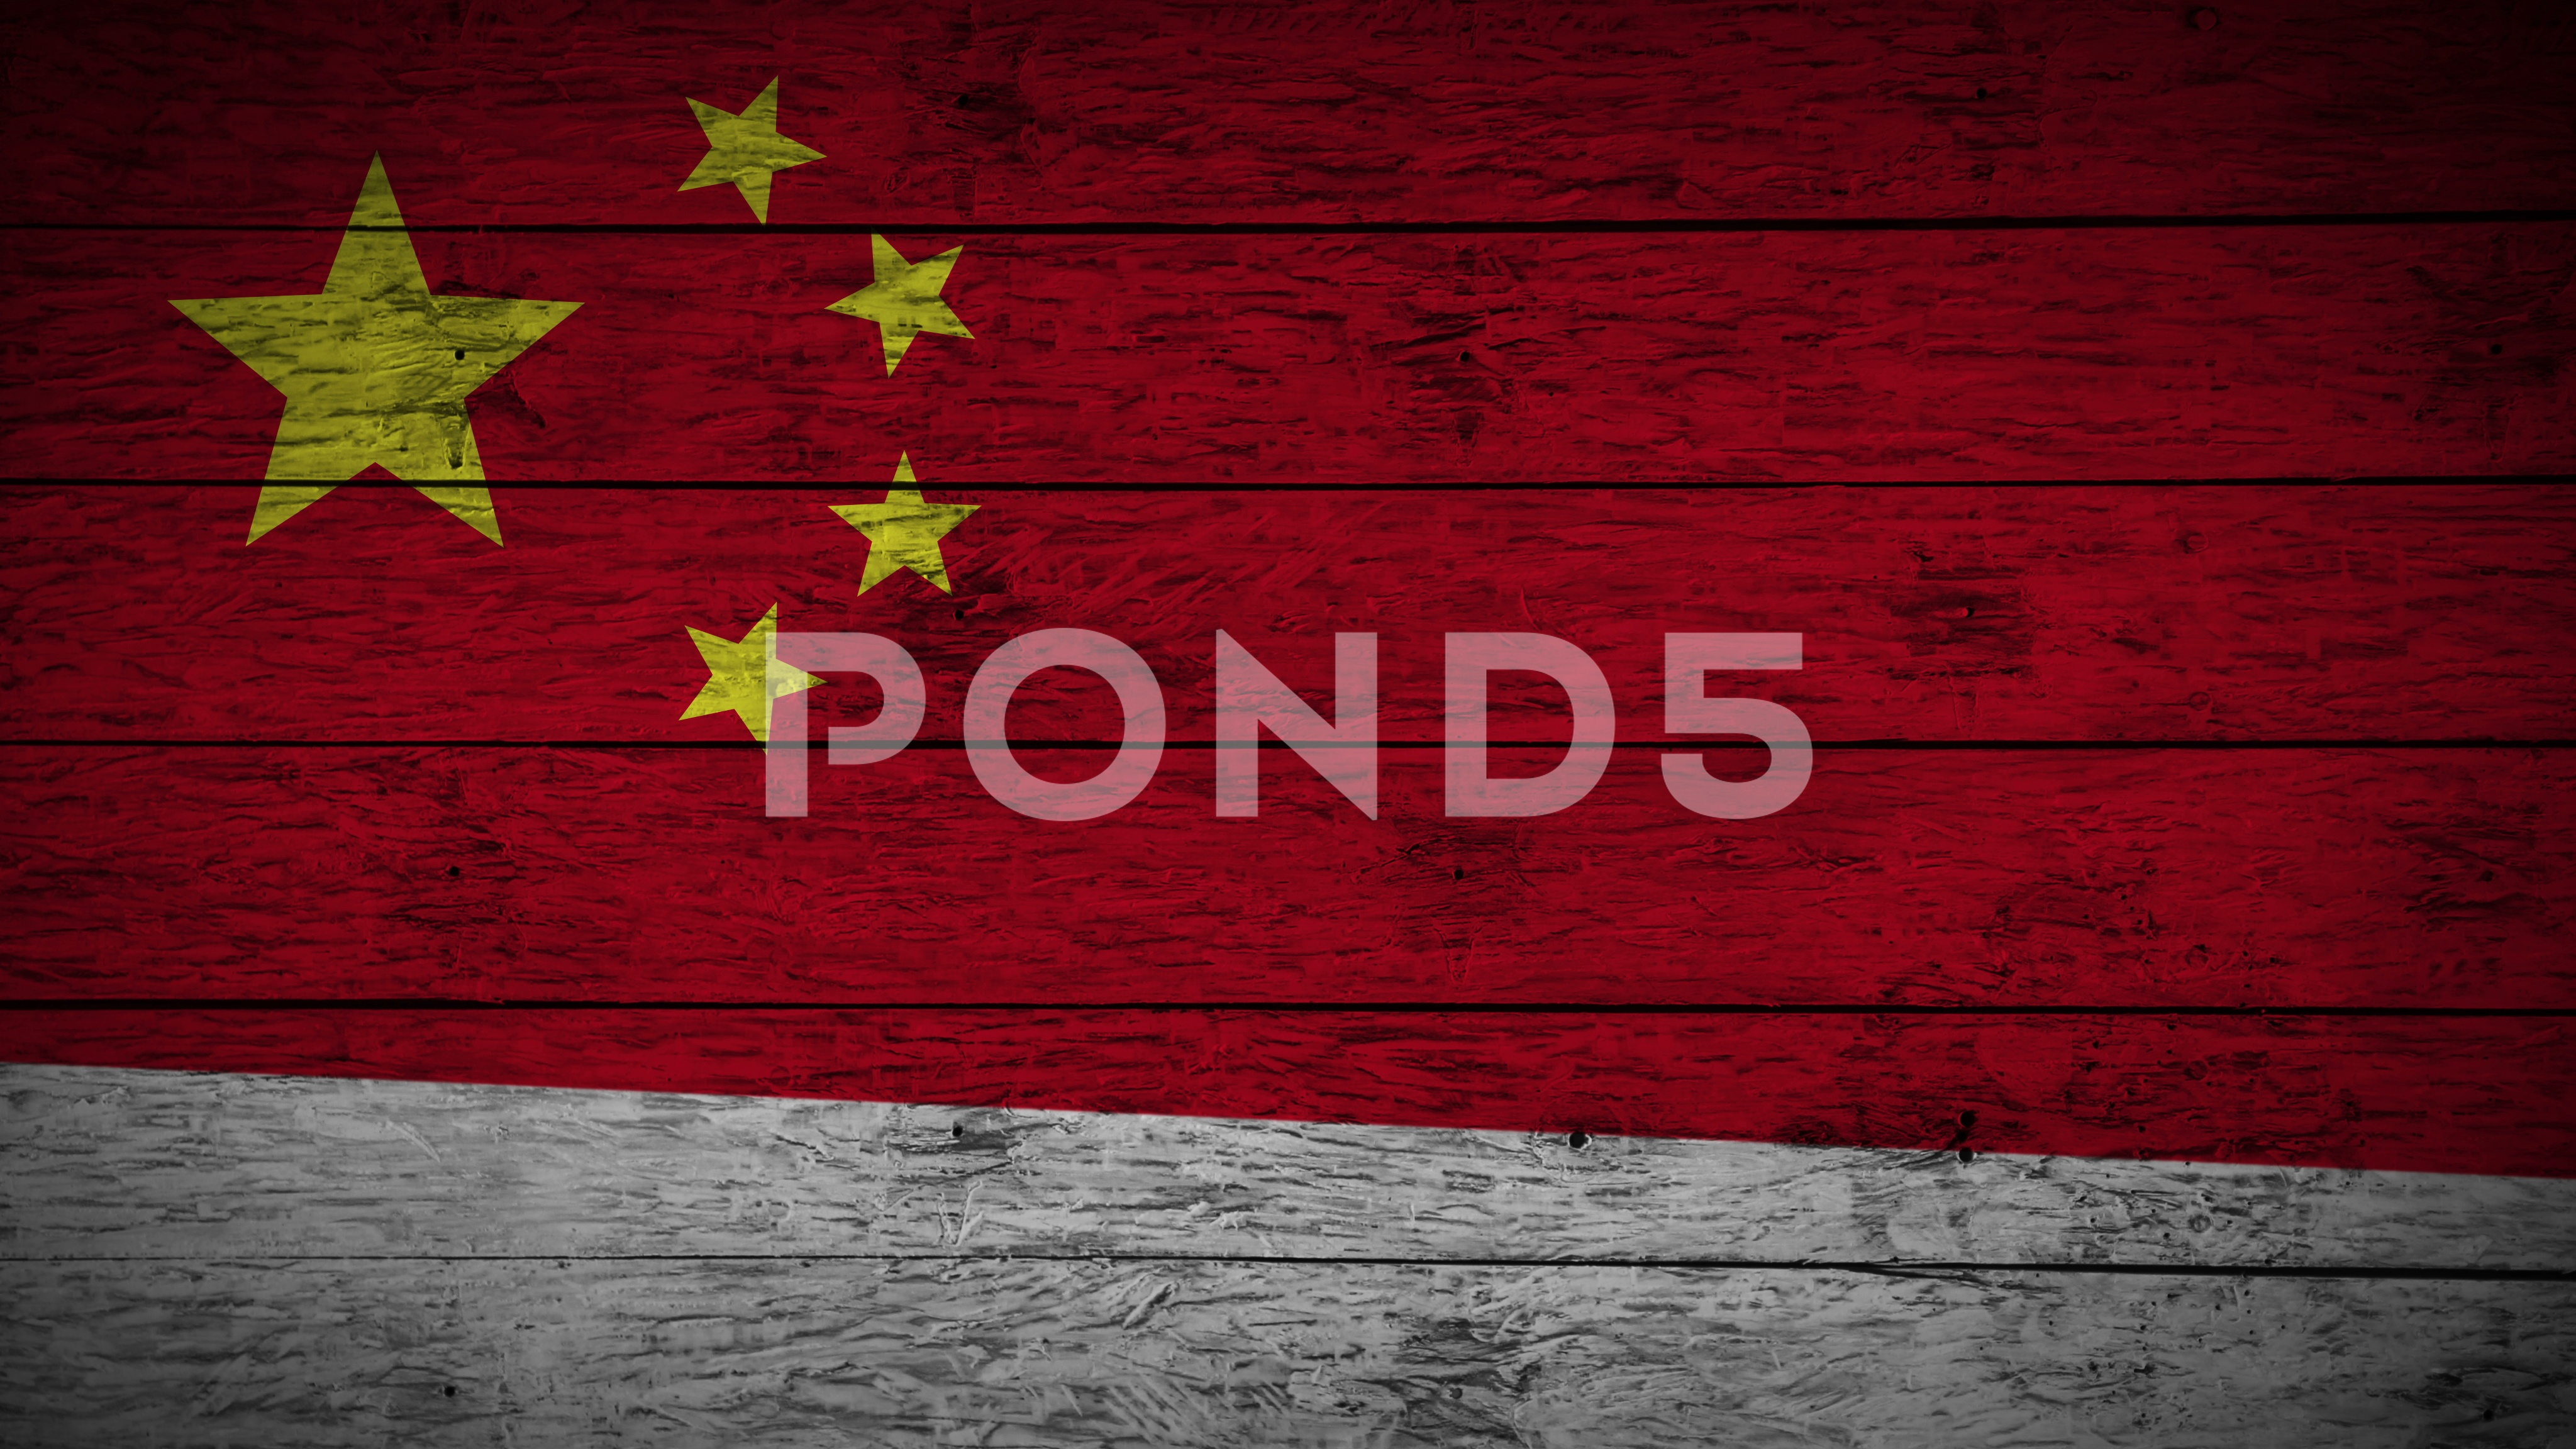 China Flag Drawing at GetDrawings.com | Free for personal use China ...